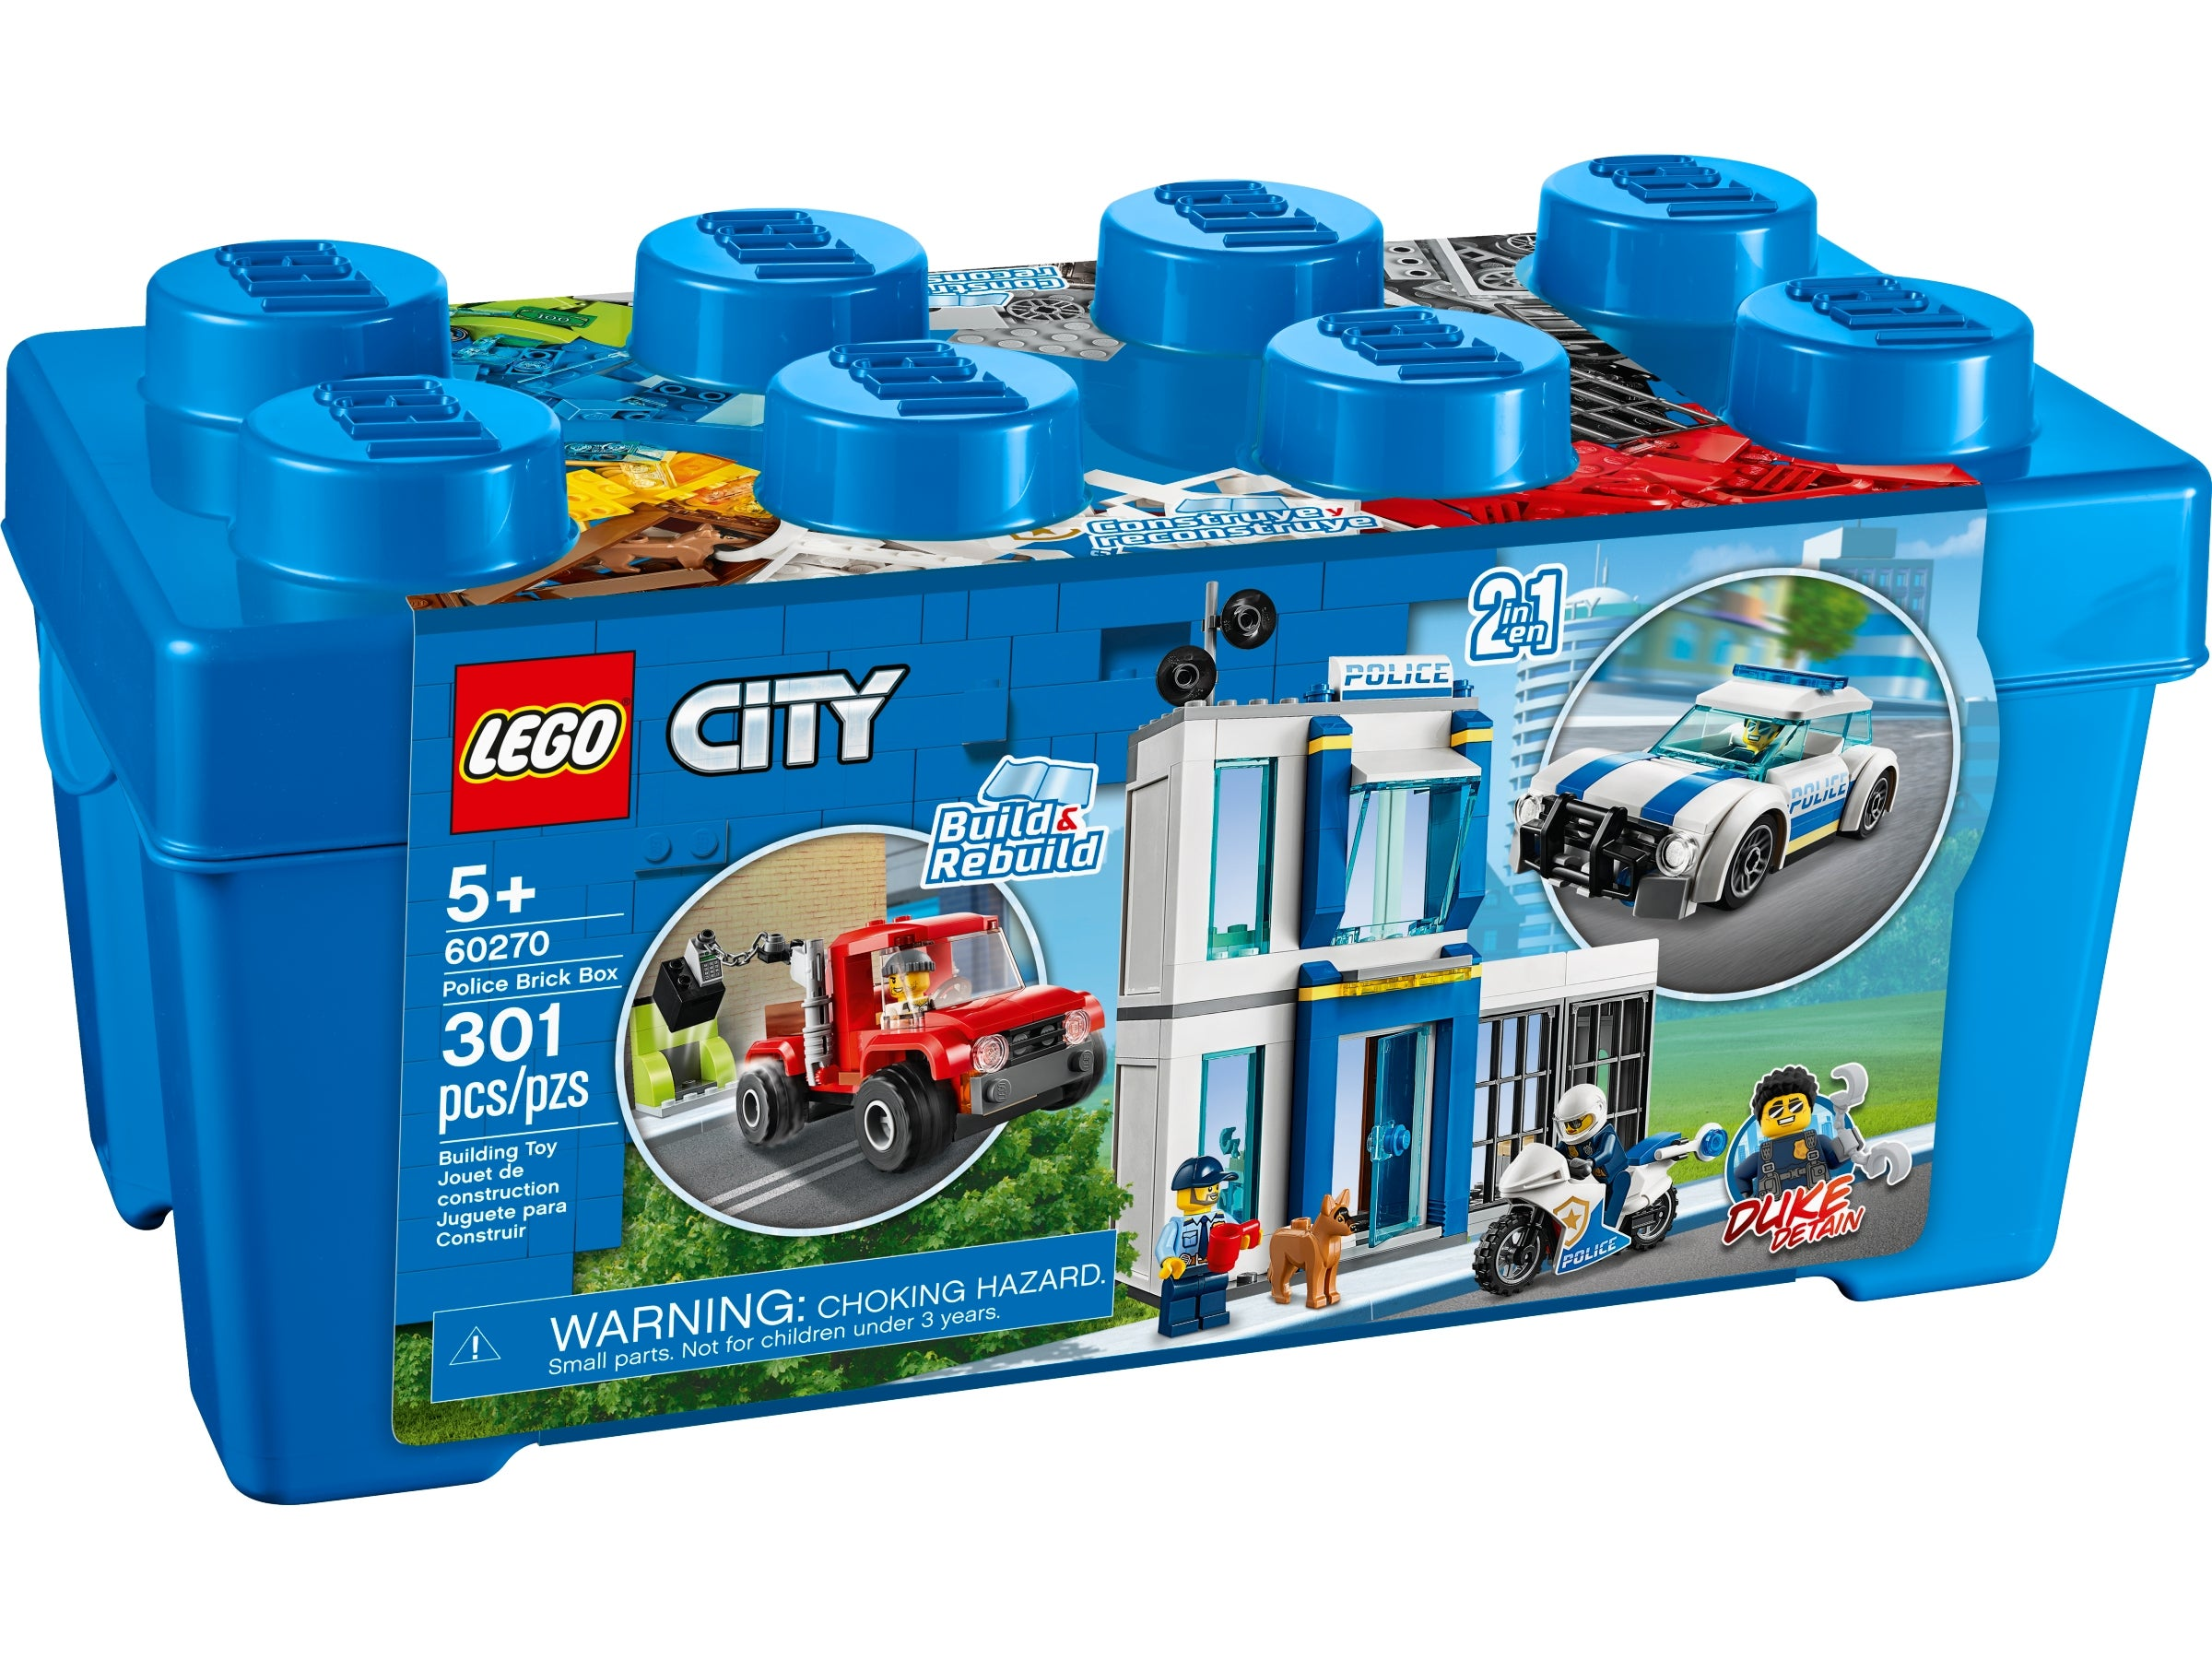 LEGO City 60270 2 in 1 Police Brick Box NEW Free Shipping